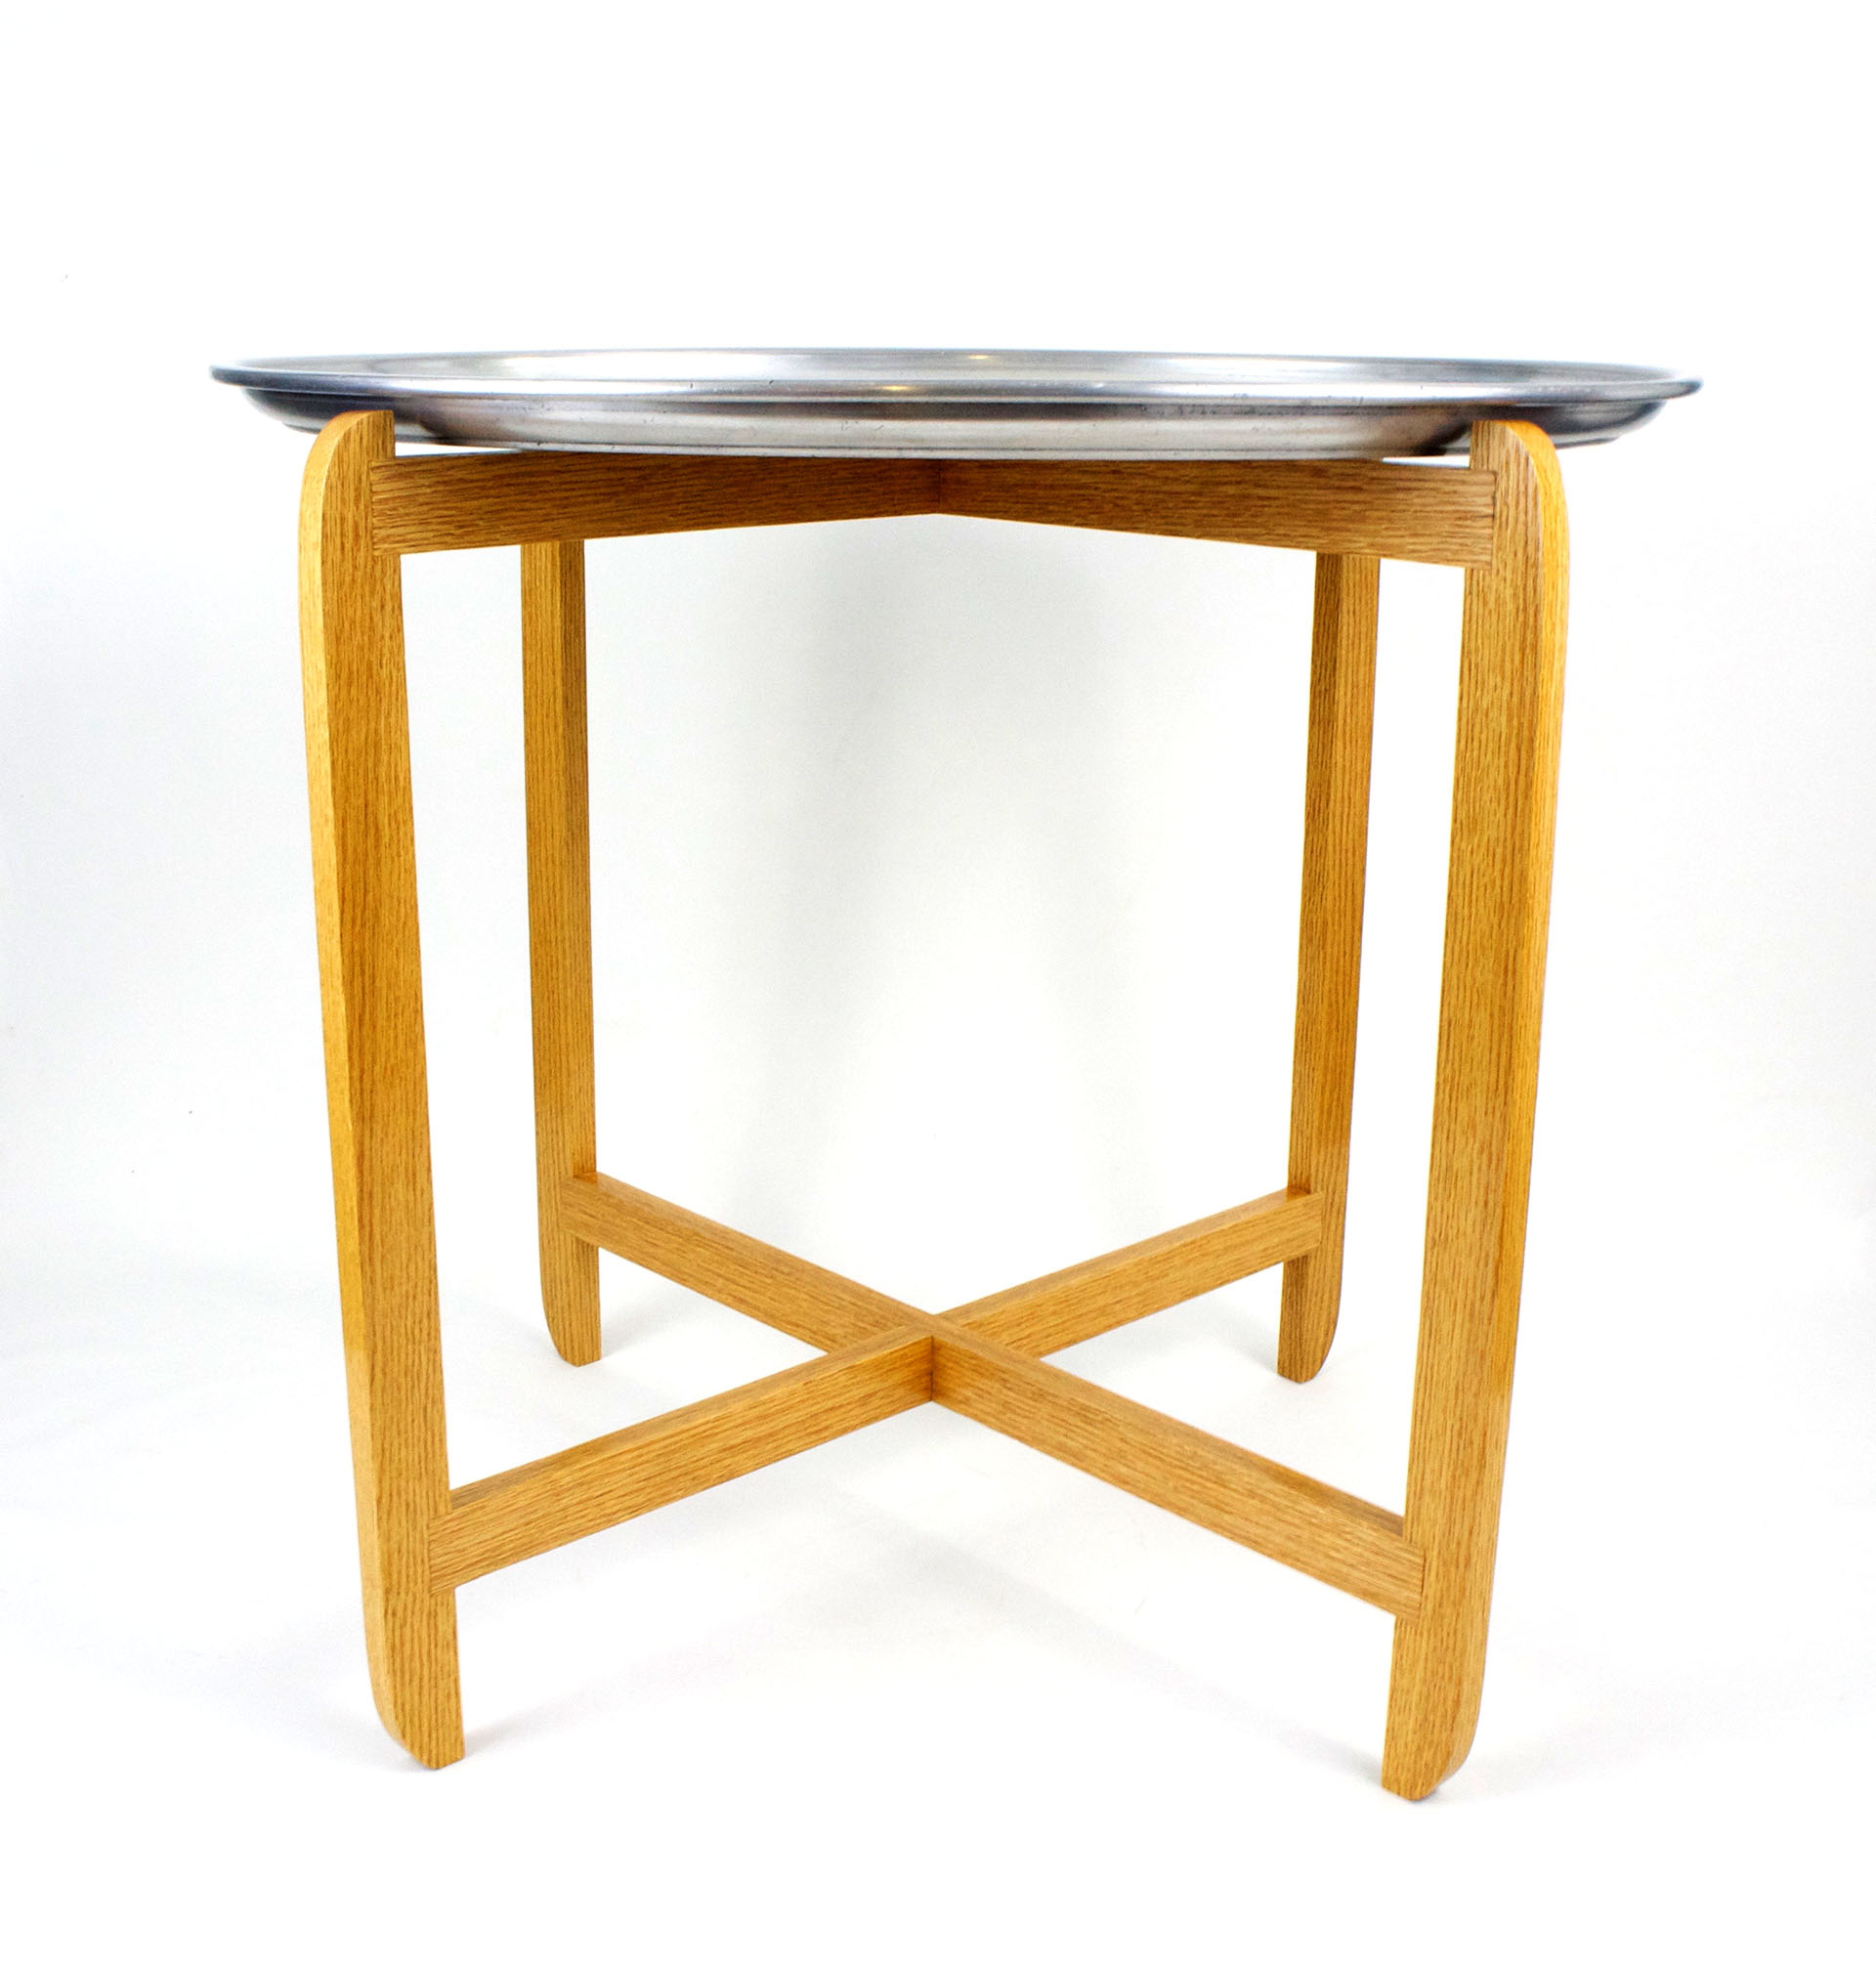 Alum tray table 2.jpg